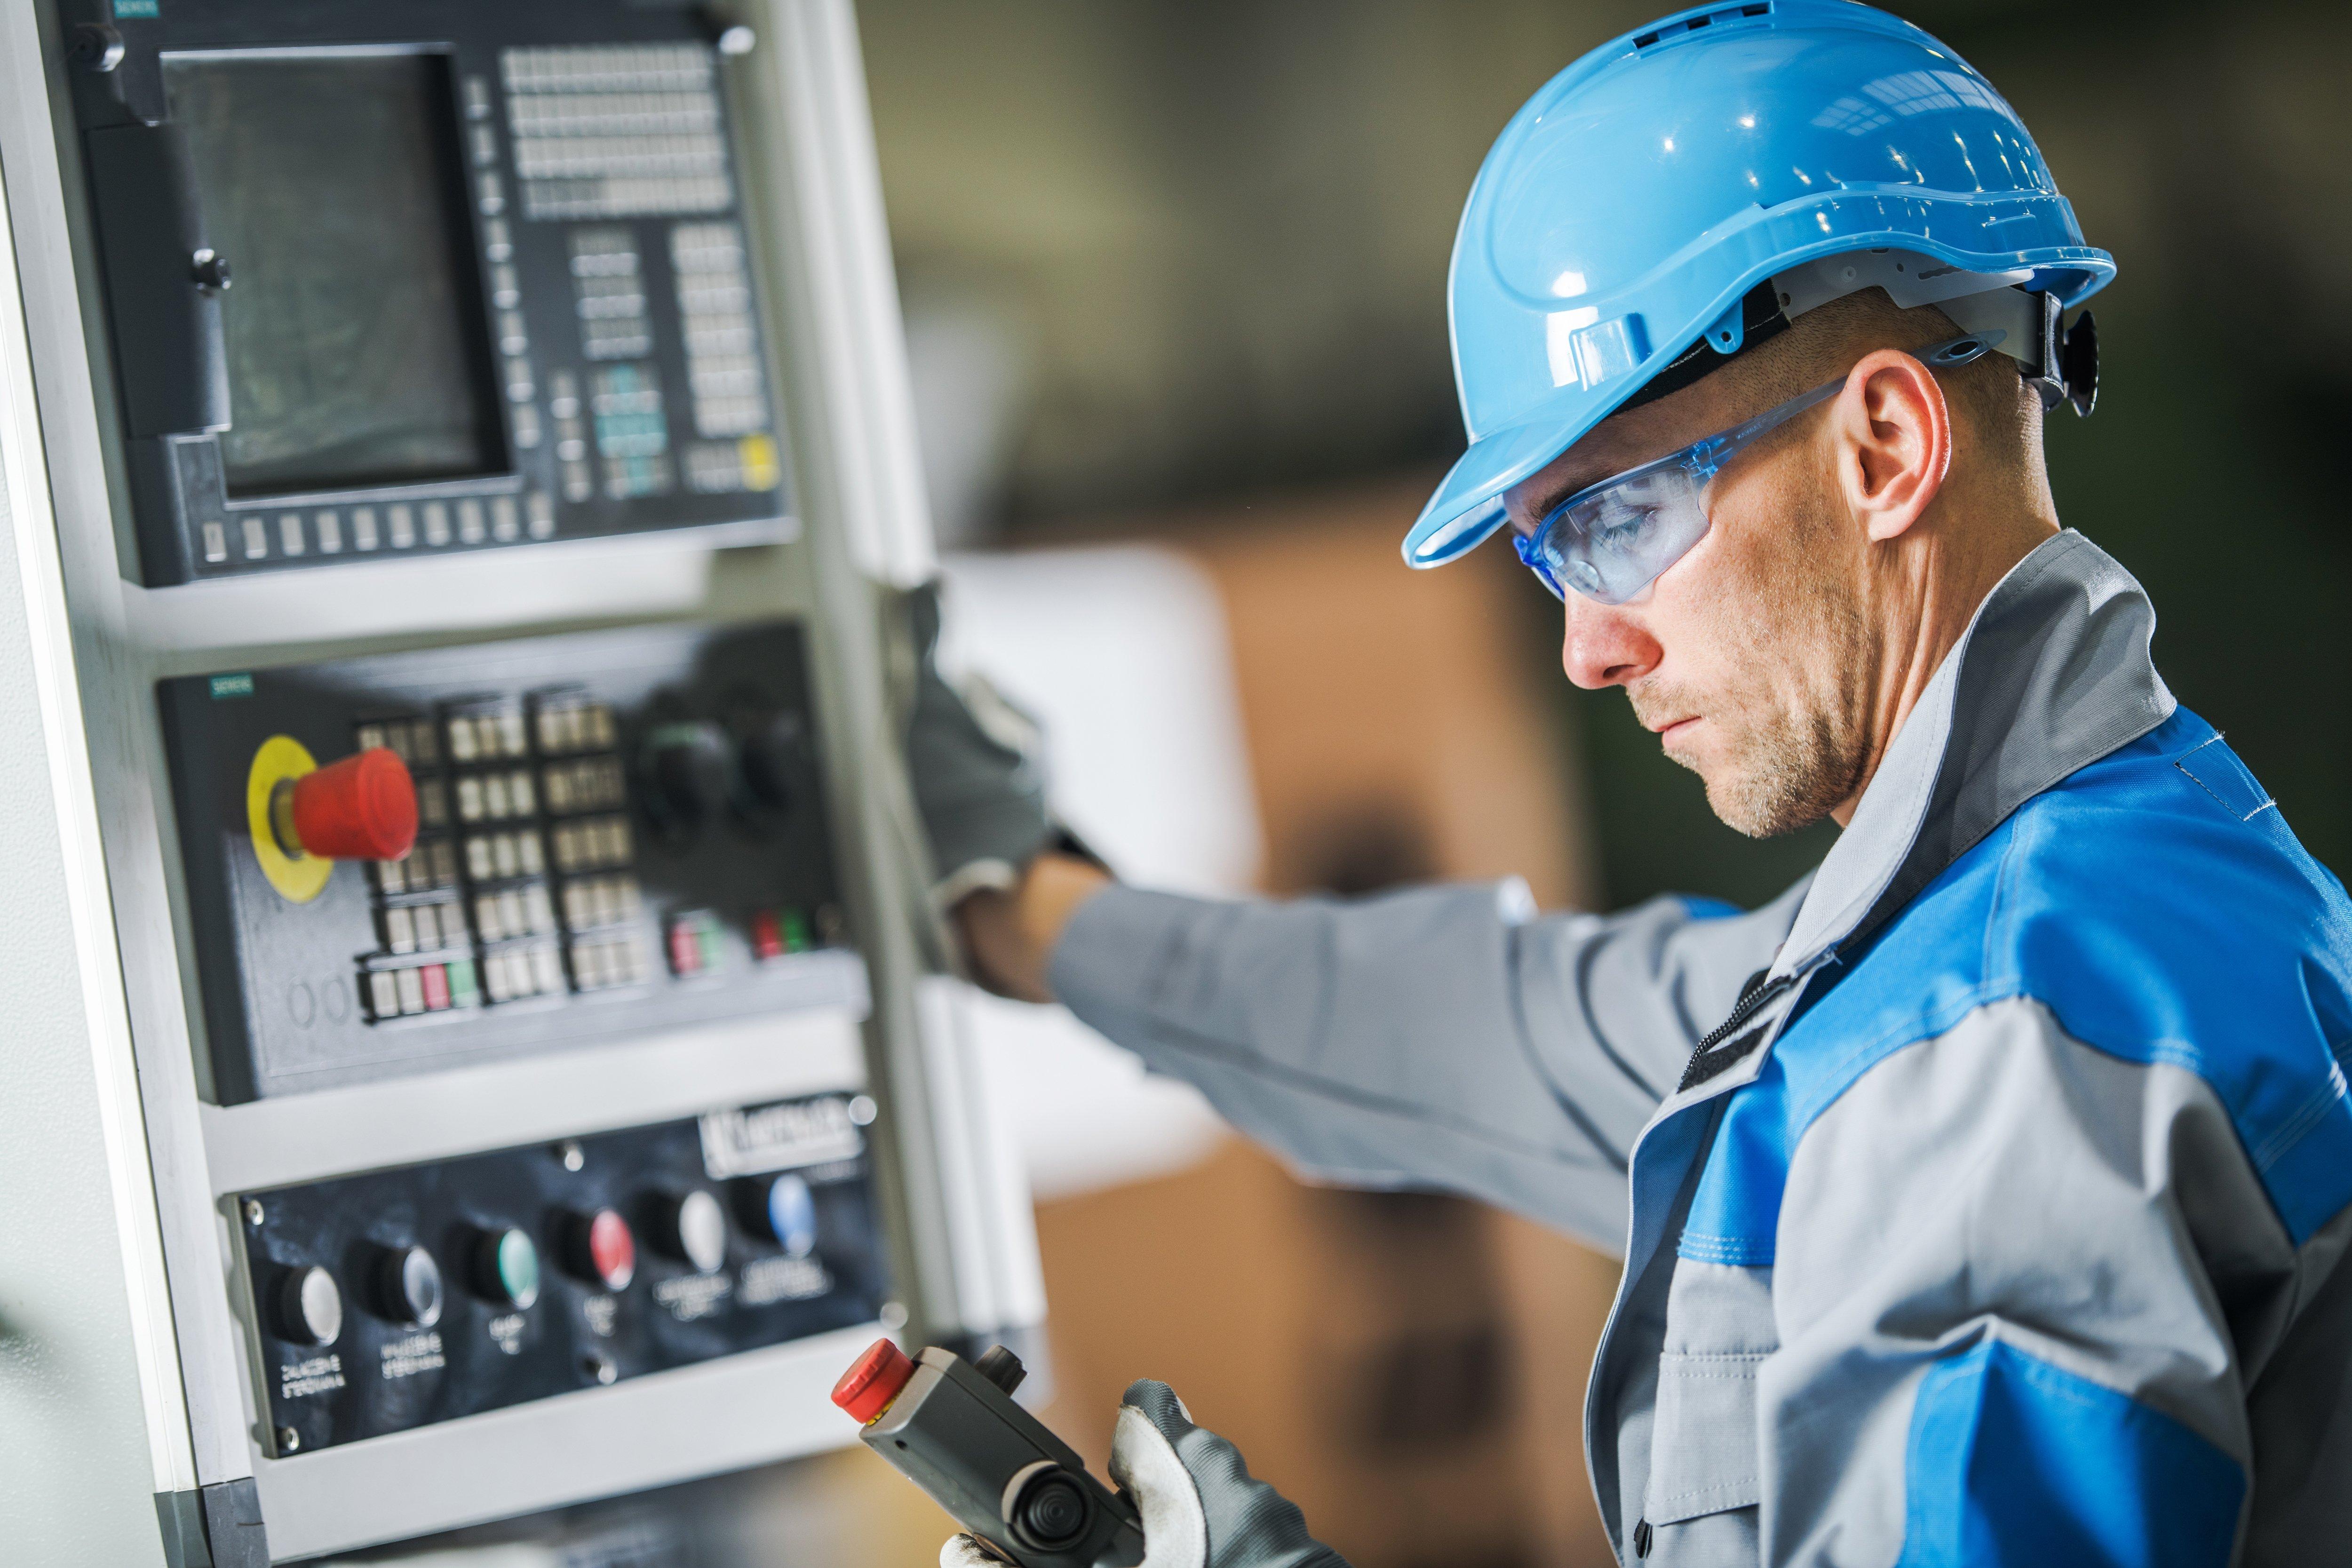 Axians Predictive Maintenance maakindustrie